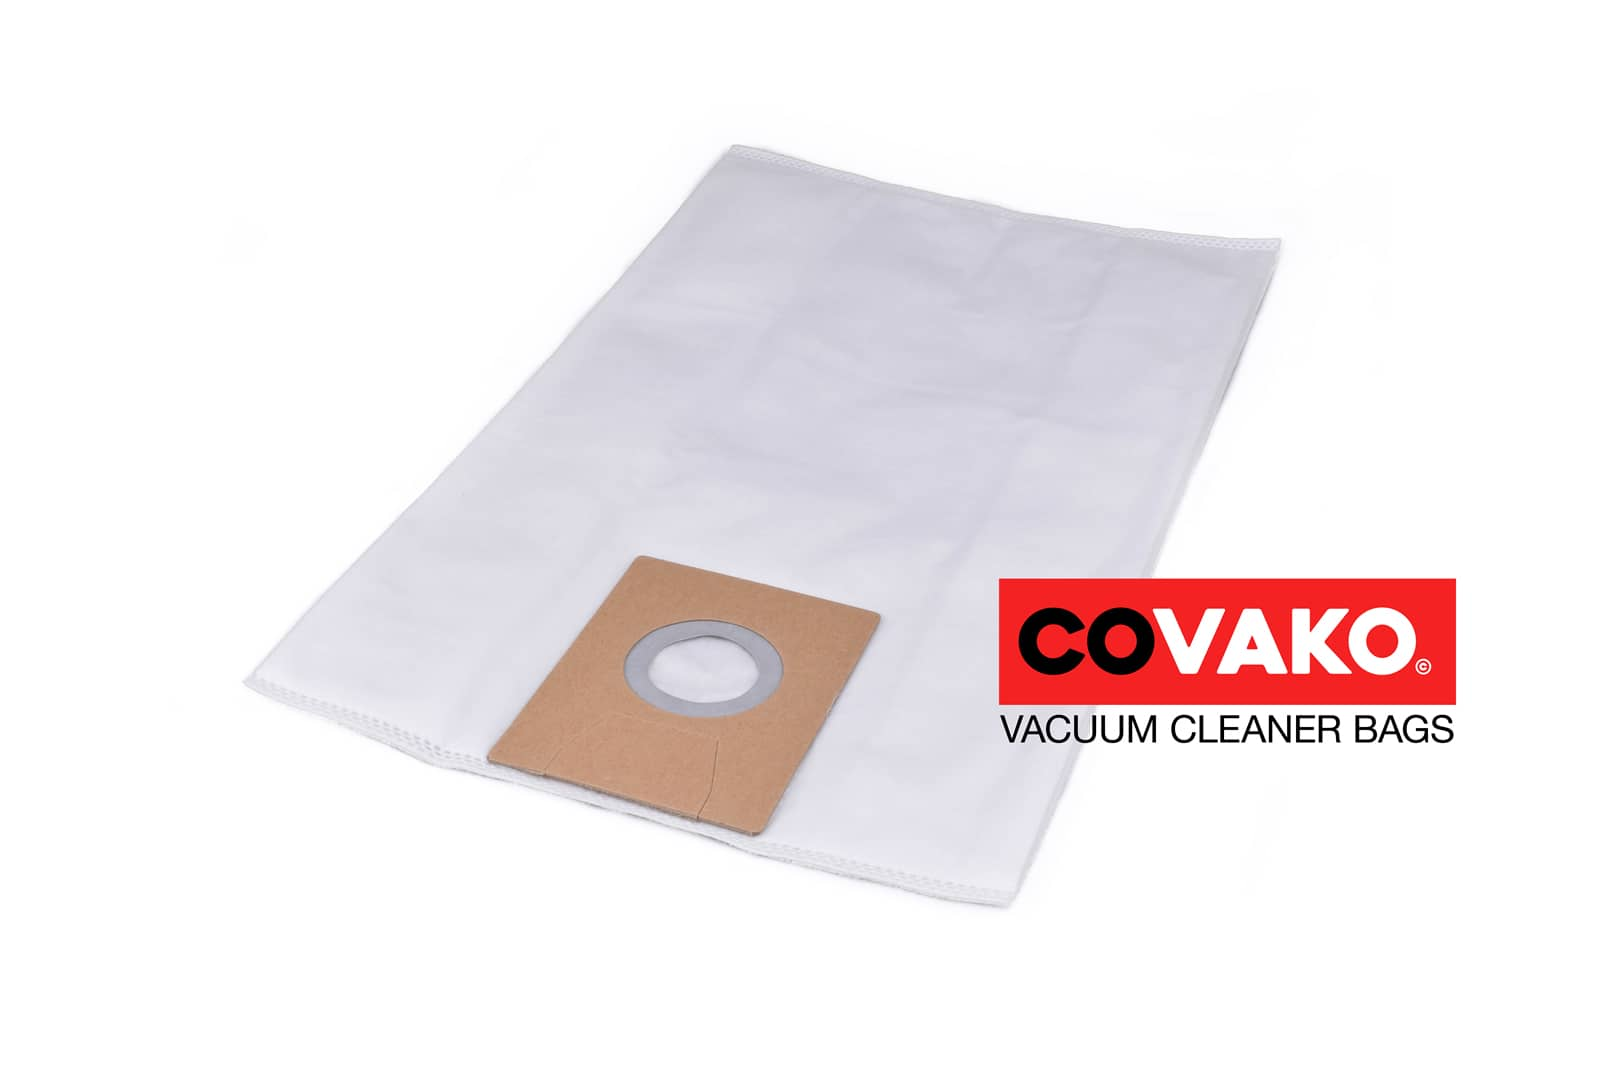 Fakir S 22 / Synthesis - Fakir vacuum cleaner bags